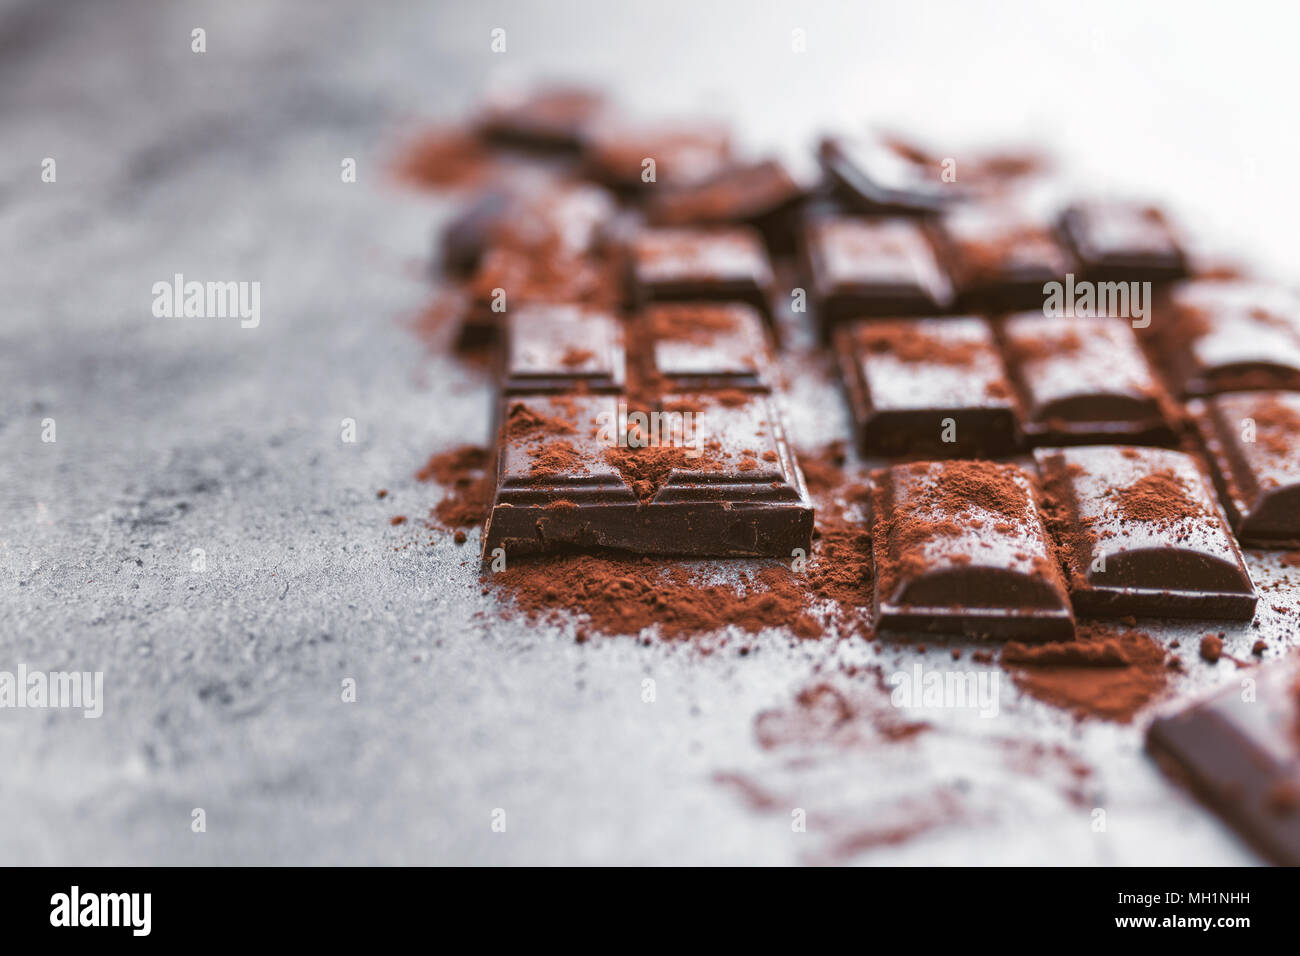 Delicious dark chocolate with cocoa porwder - Stock Image